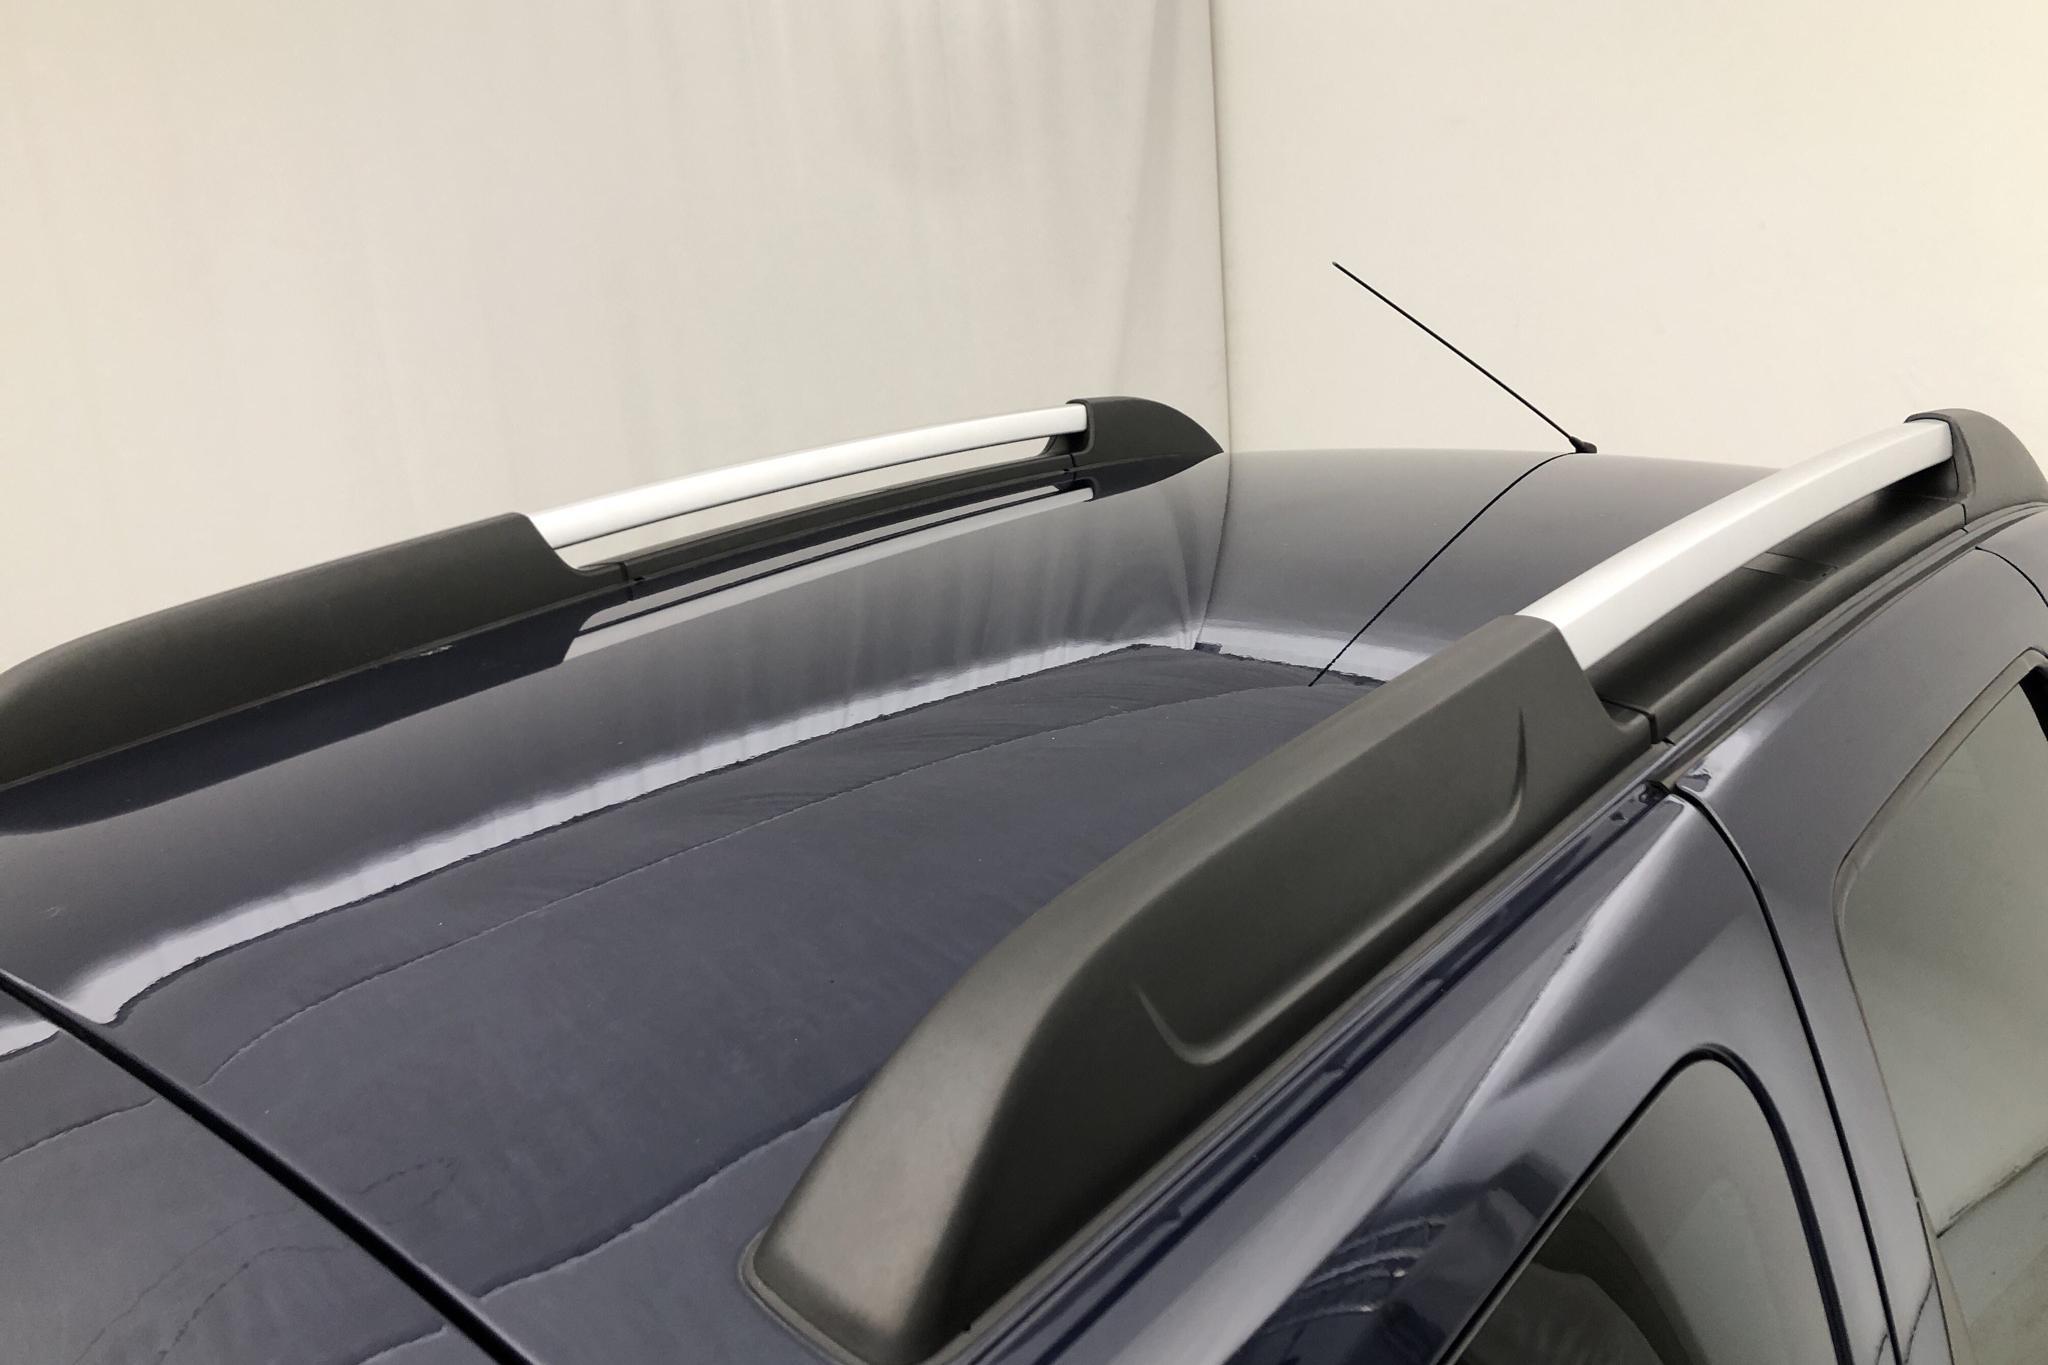 Dacia Duster 1.6 4x2 (105hk) - 11 843 mil - Manuell - blå - 2013